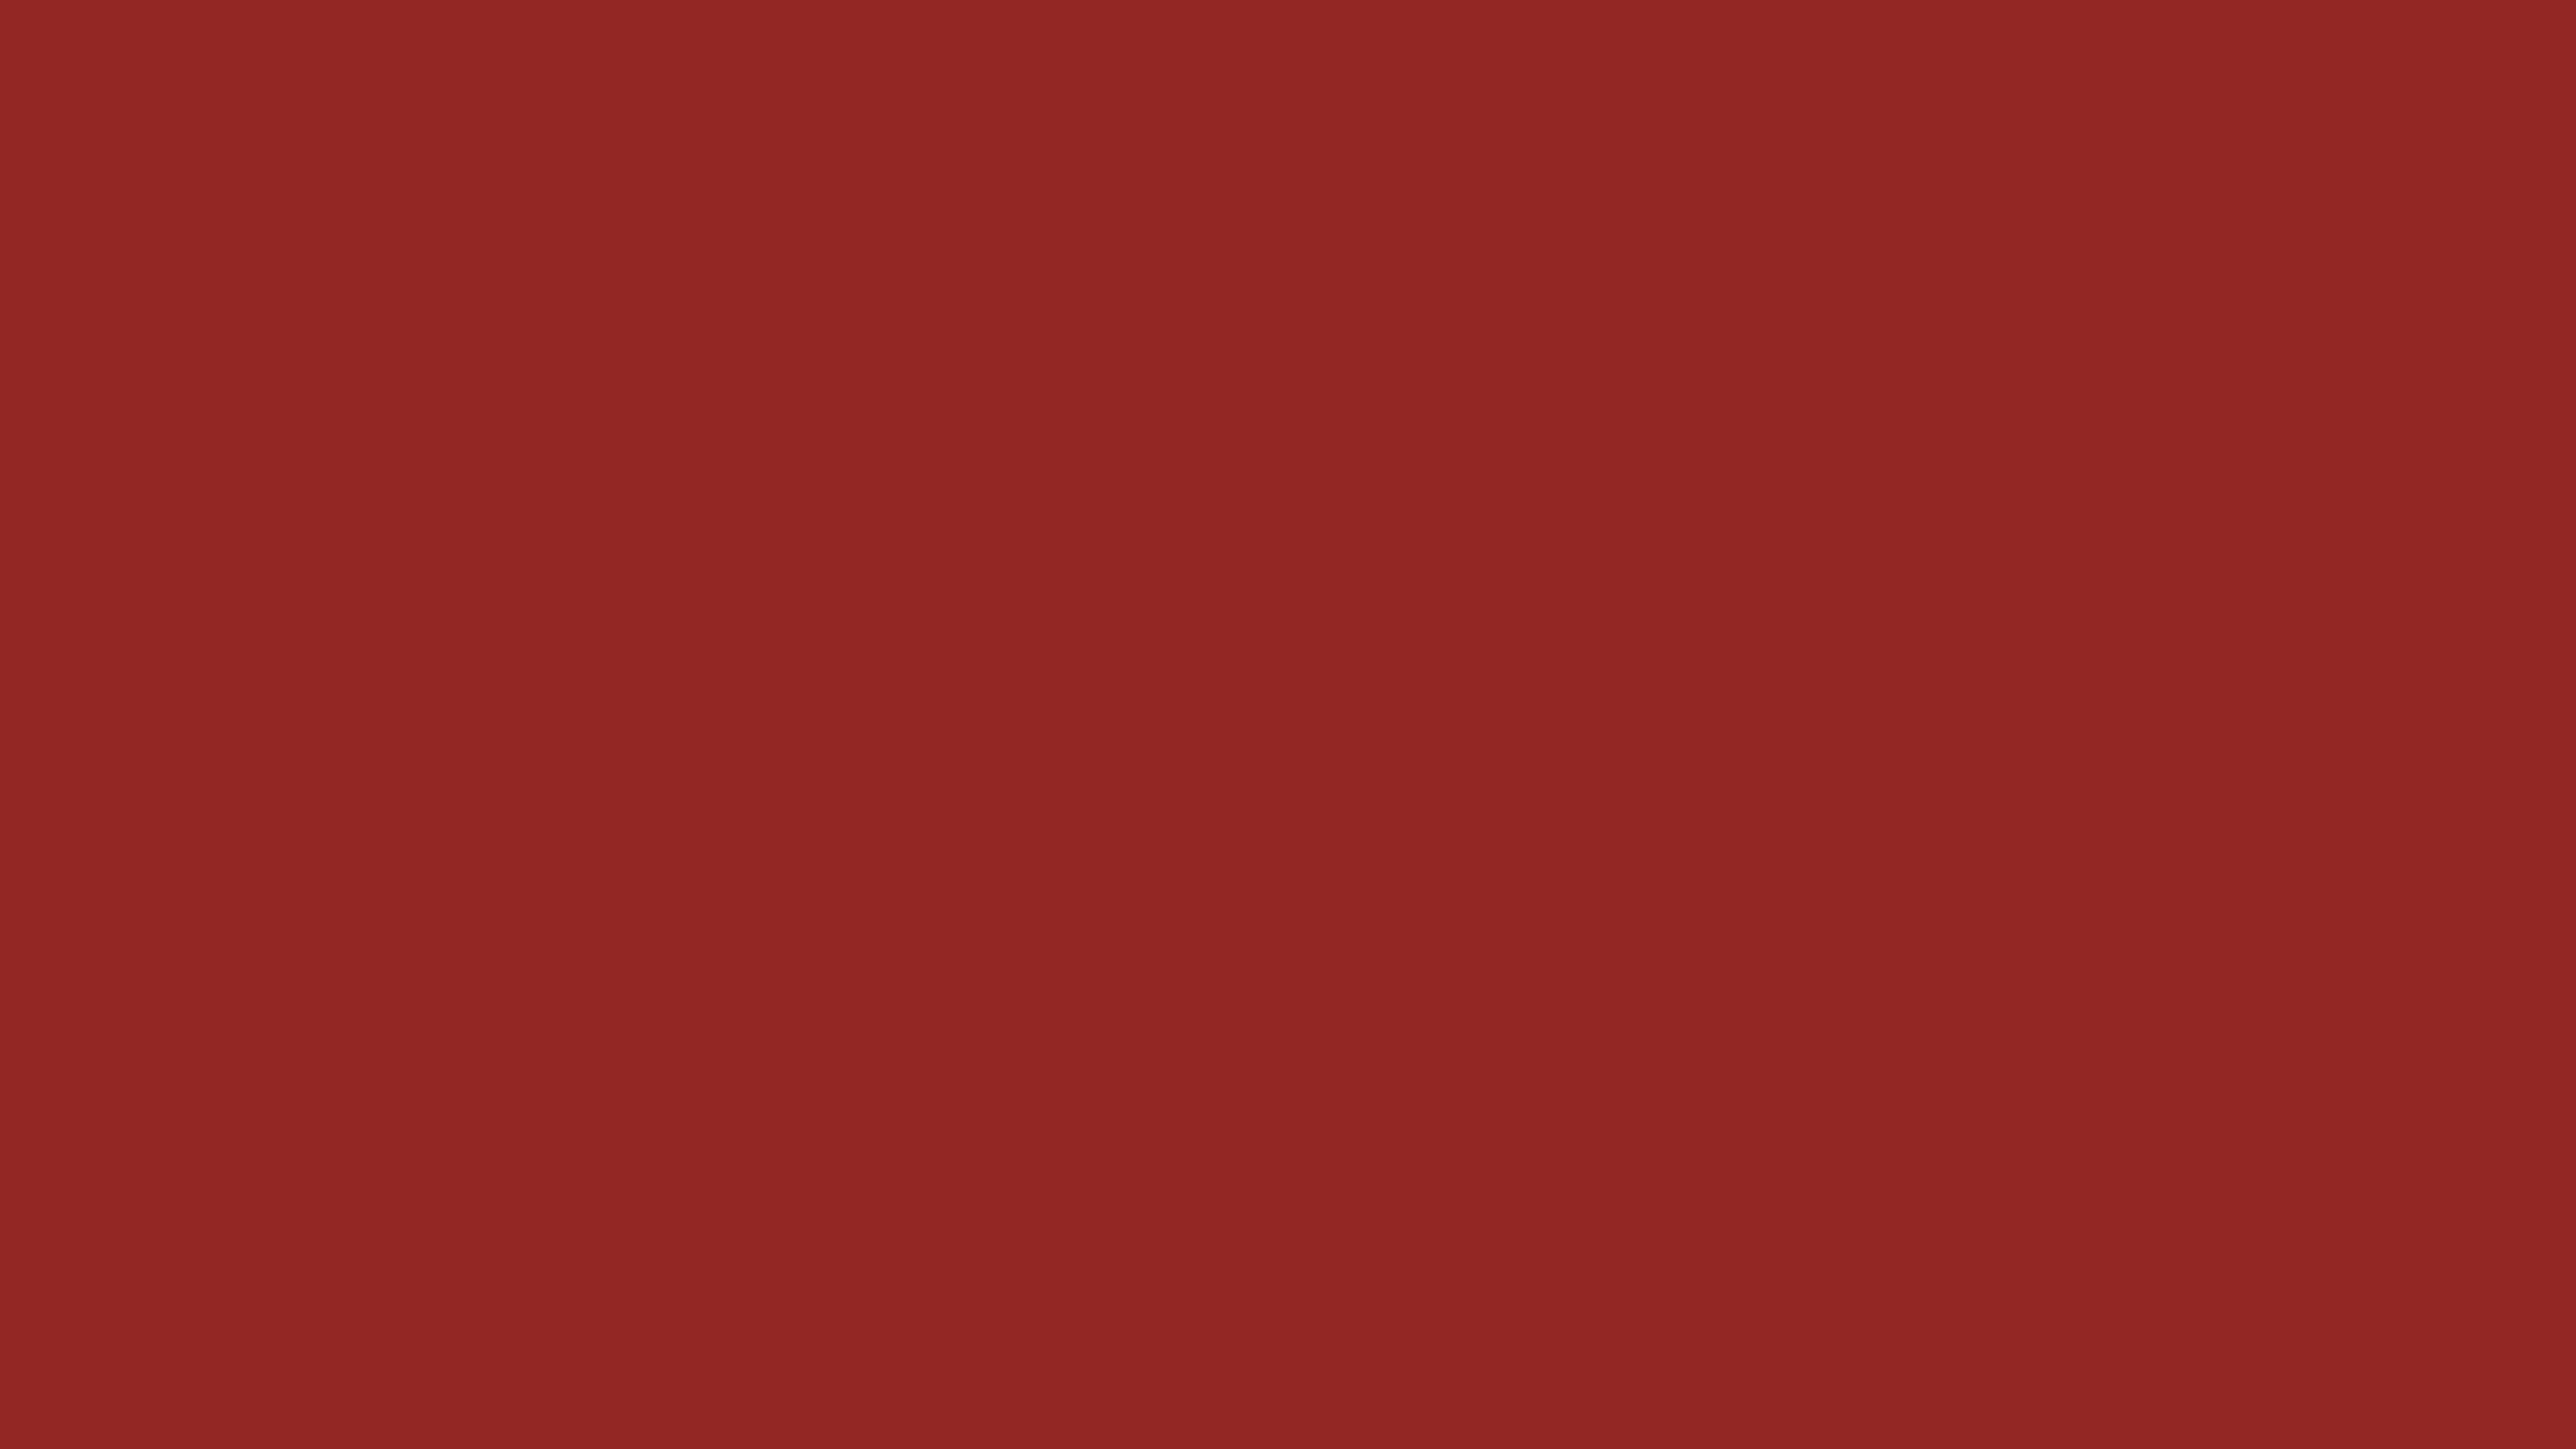 5120x2880 Vivid Auburn Solid Color Background